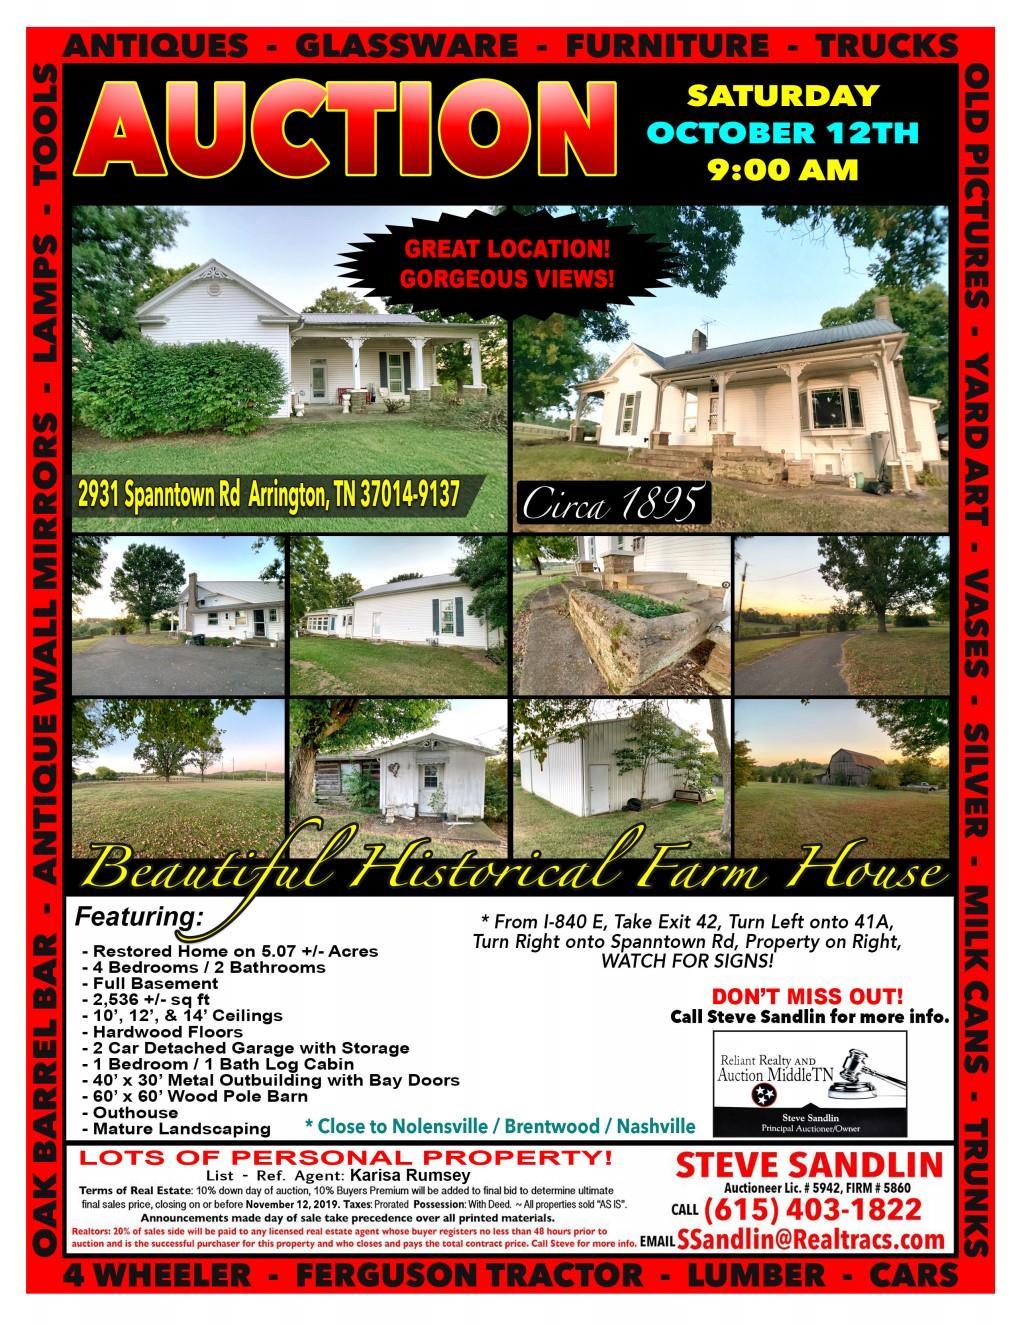 5+ Ac Real Estate Listings Main Image